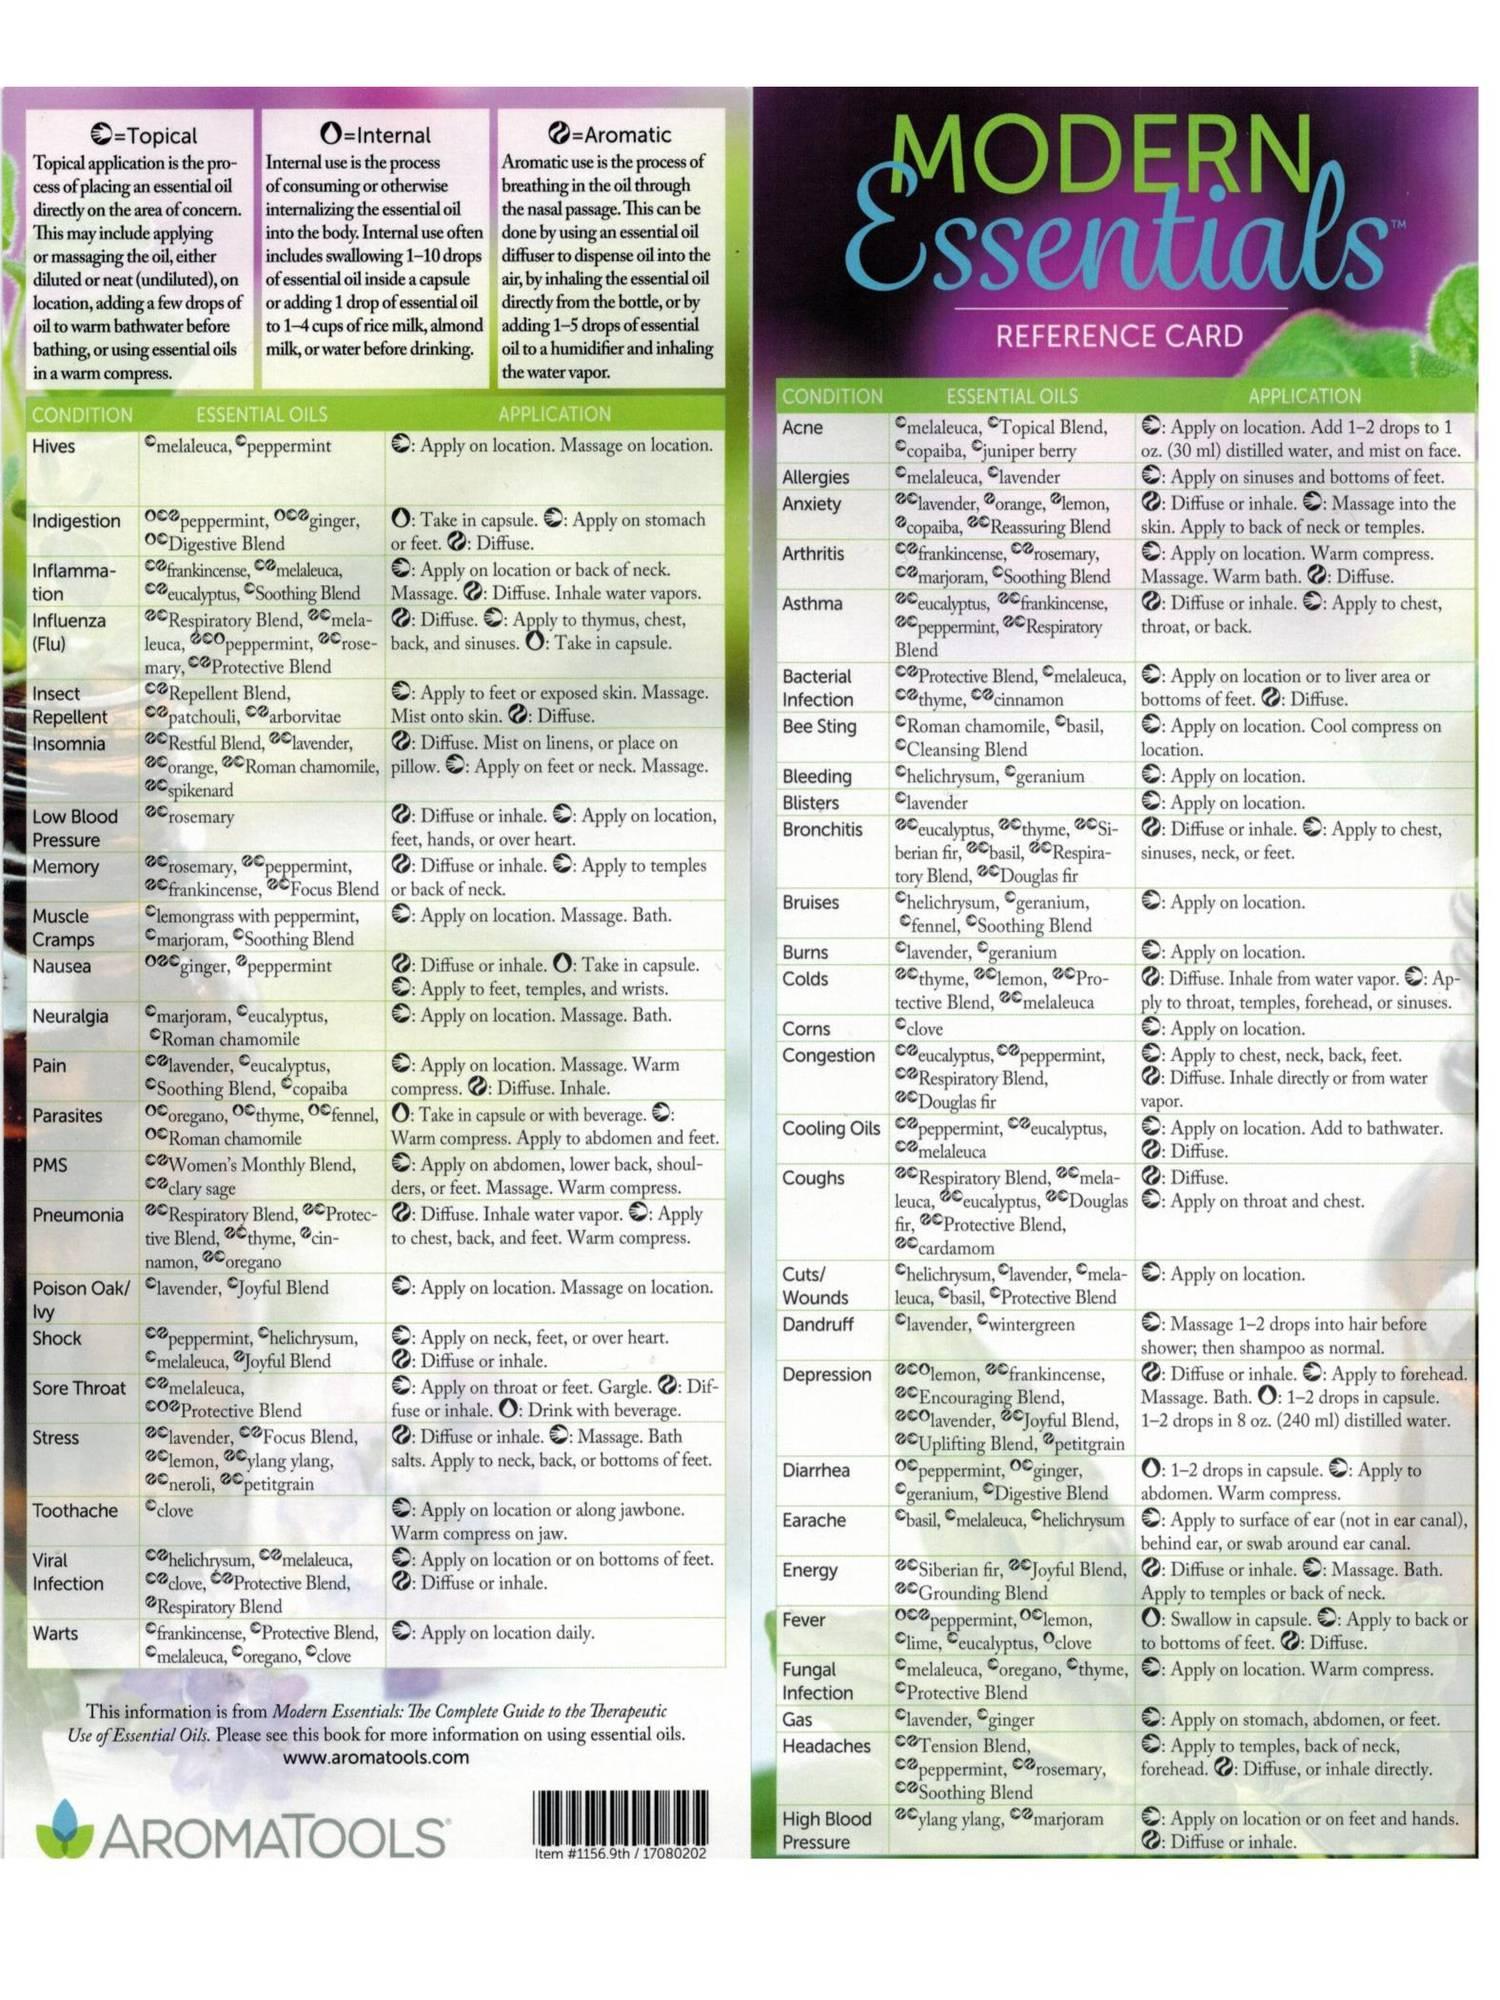 Modern Essentials Reference Card.pptx  DocDroid